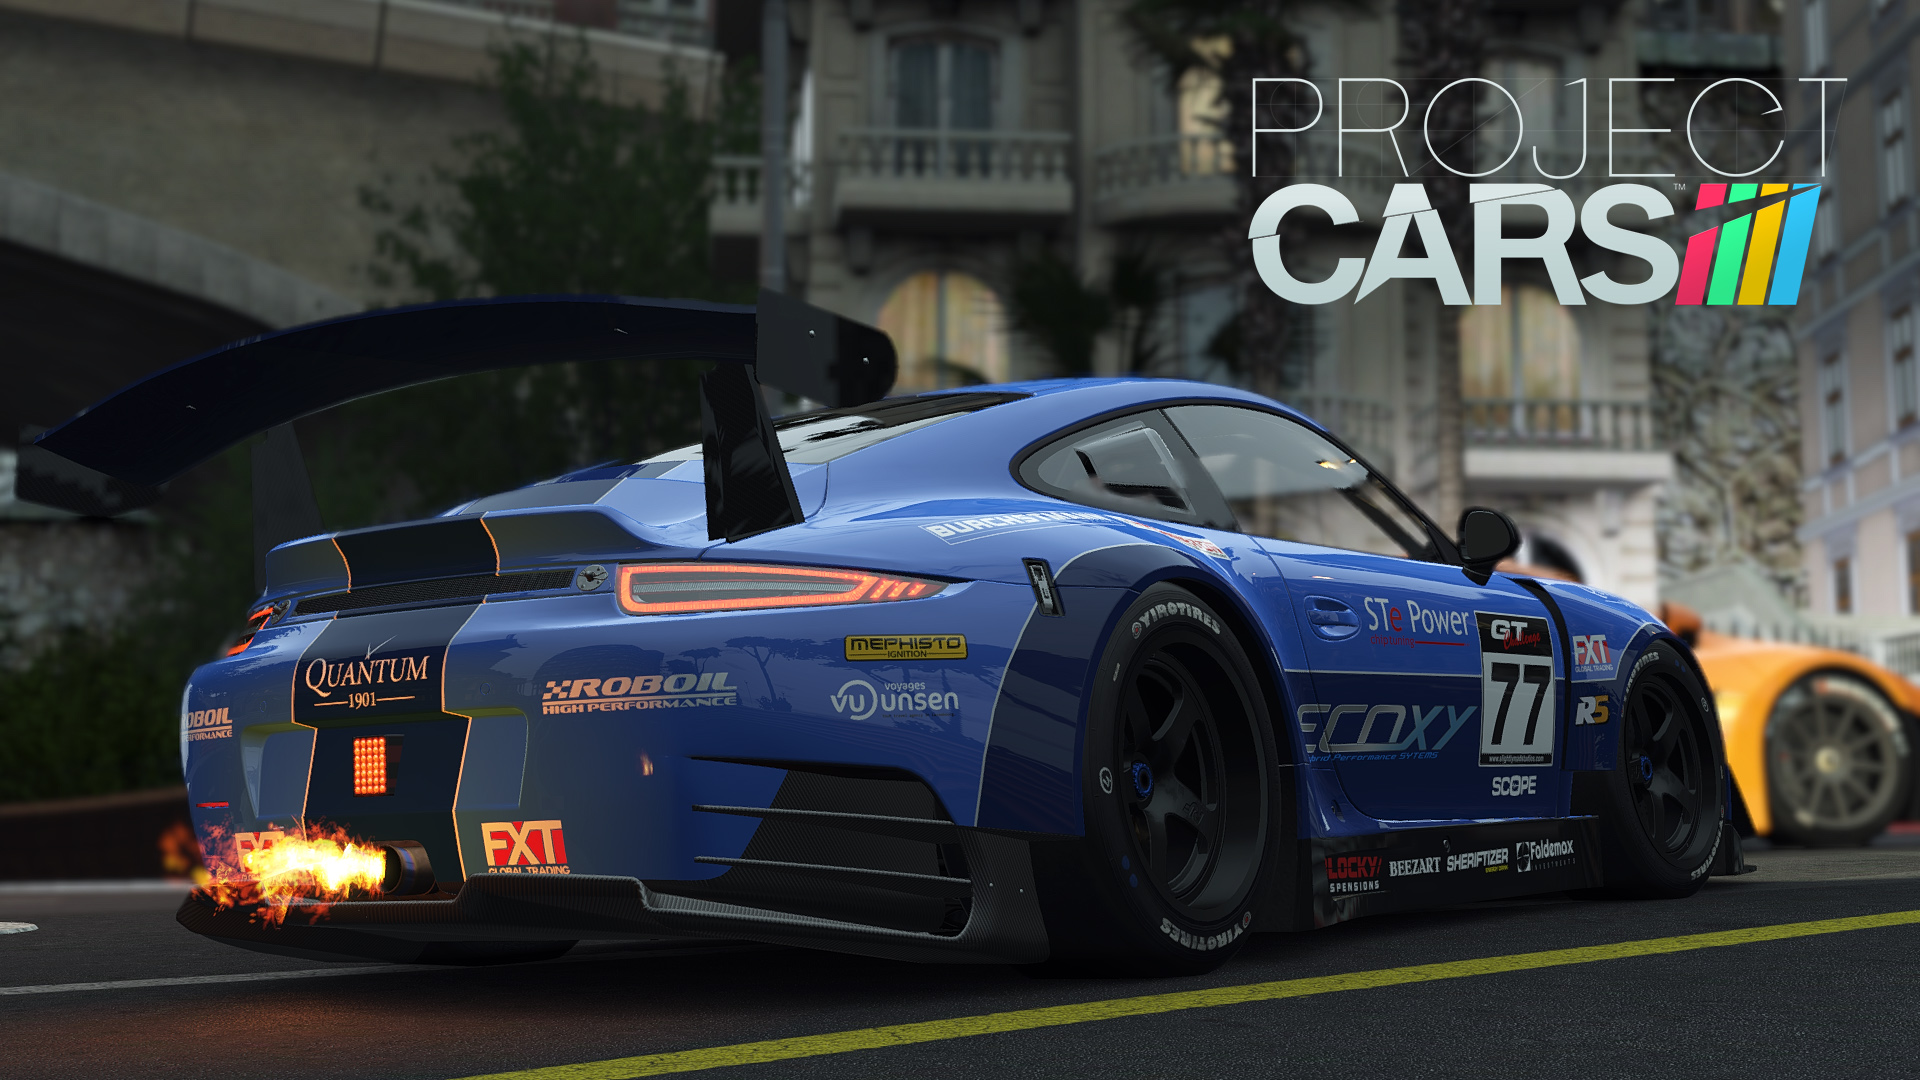 PROJECT-CARS_tecnodia